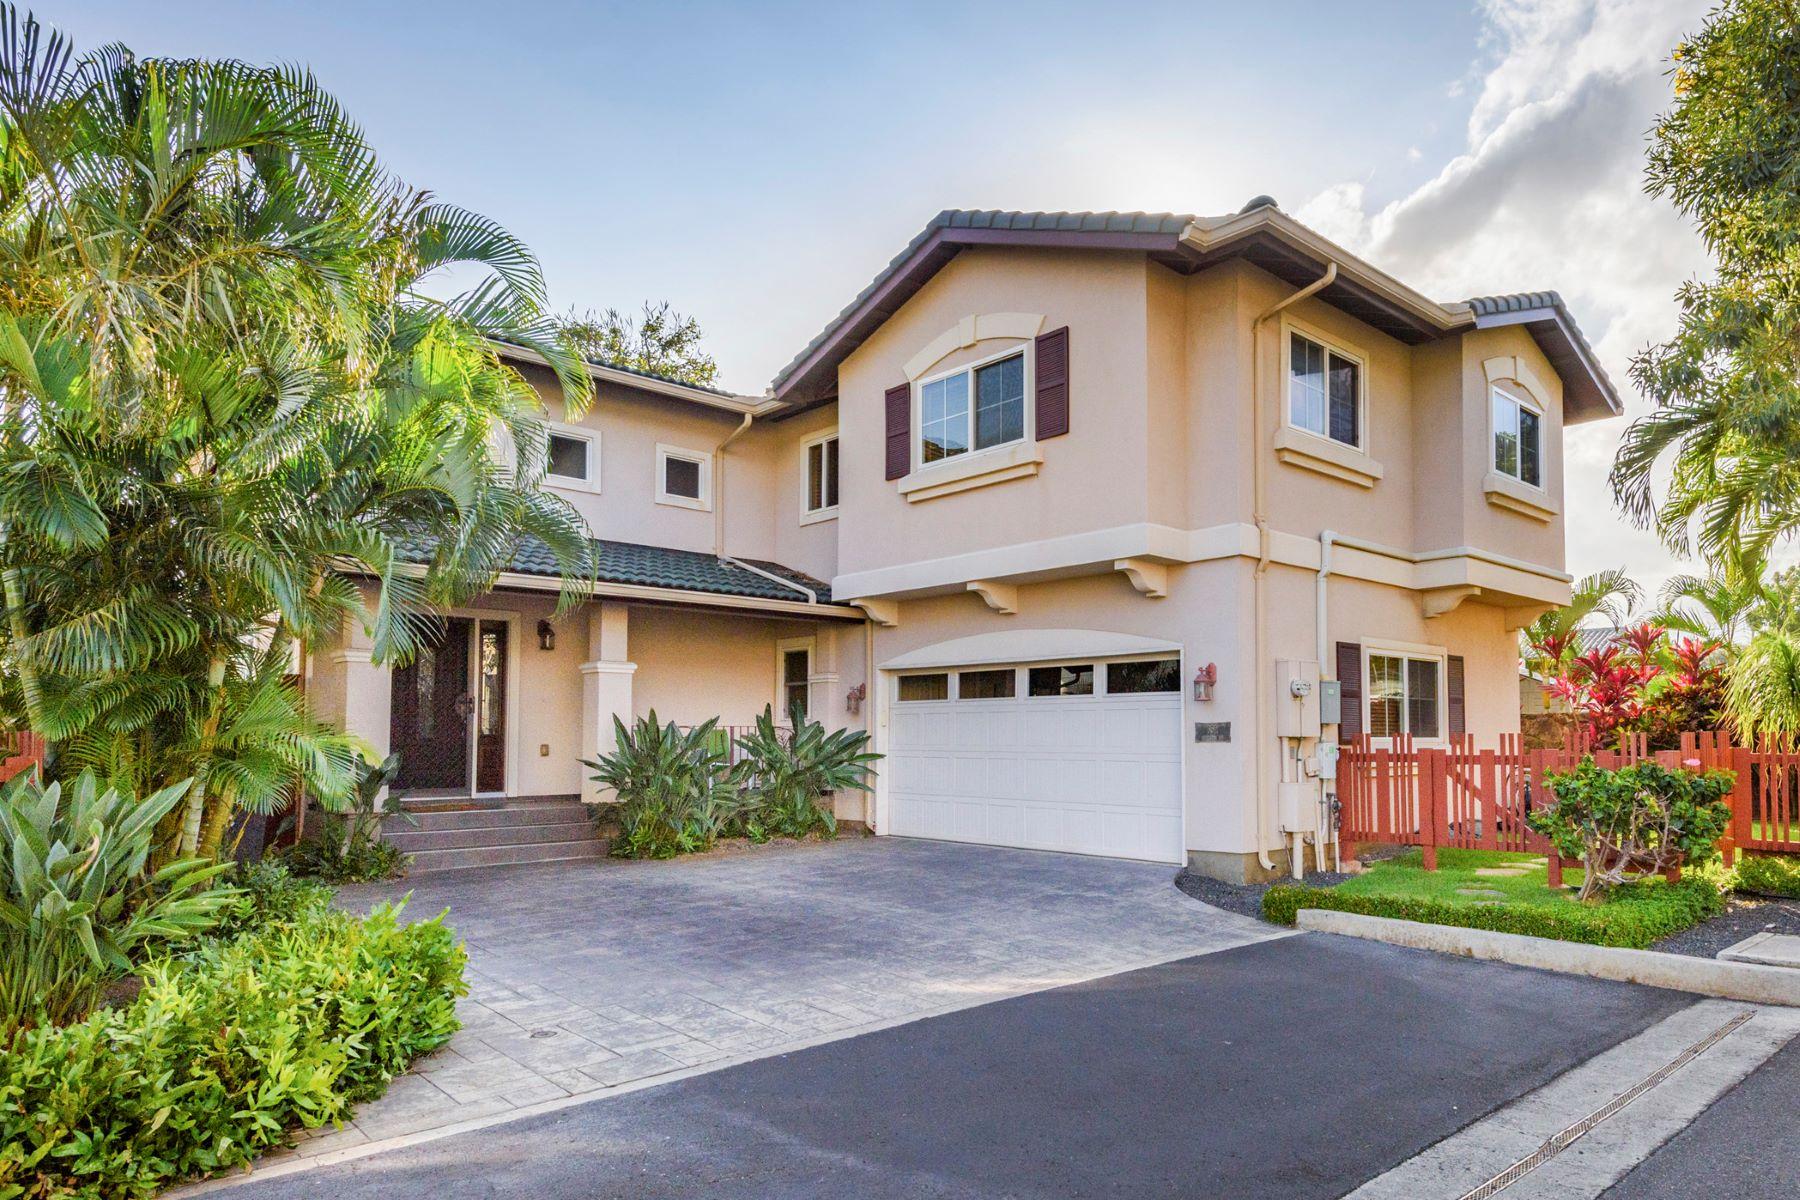 Casa Unifamiliar por un Venta en Kuhina at Kahala Executive Home 652 Hunalewa Street Honolulu, Hawaii, 96816 Estados UnidosEn/Alrededor: Kahala